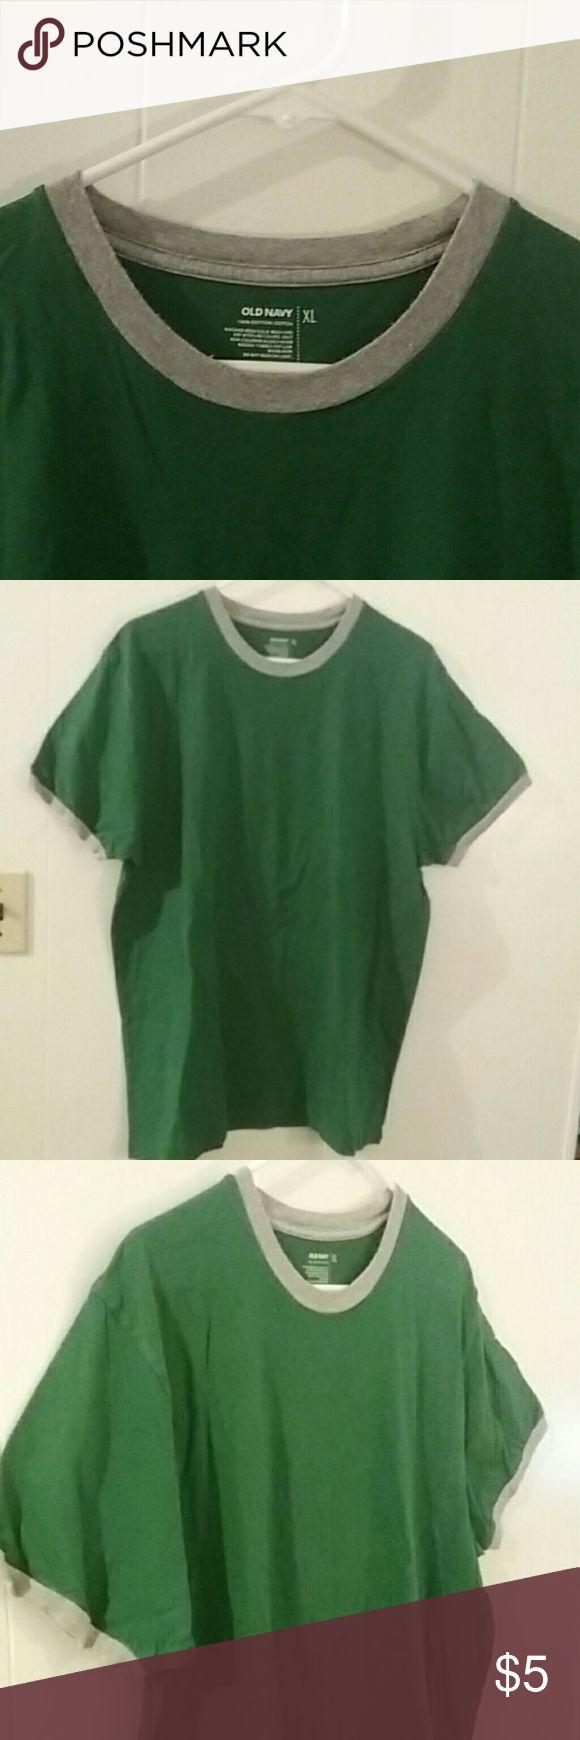 Green Old Navy Tee Dark Green Old Navy short sleeved mens tee//100% cotton// XL. Old Navy Shirts Tees - Short Sleeve